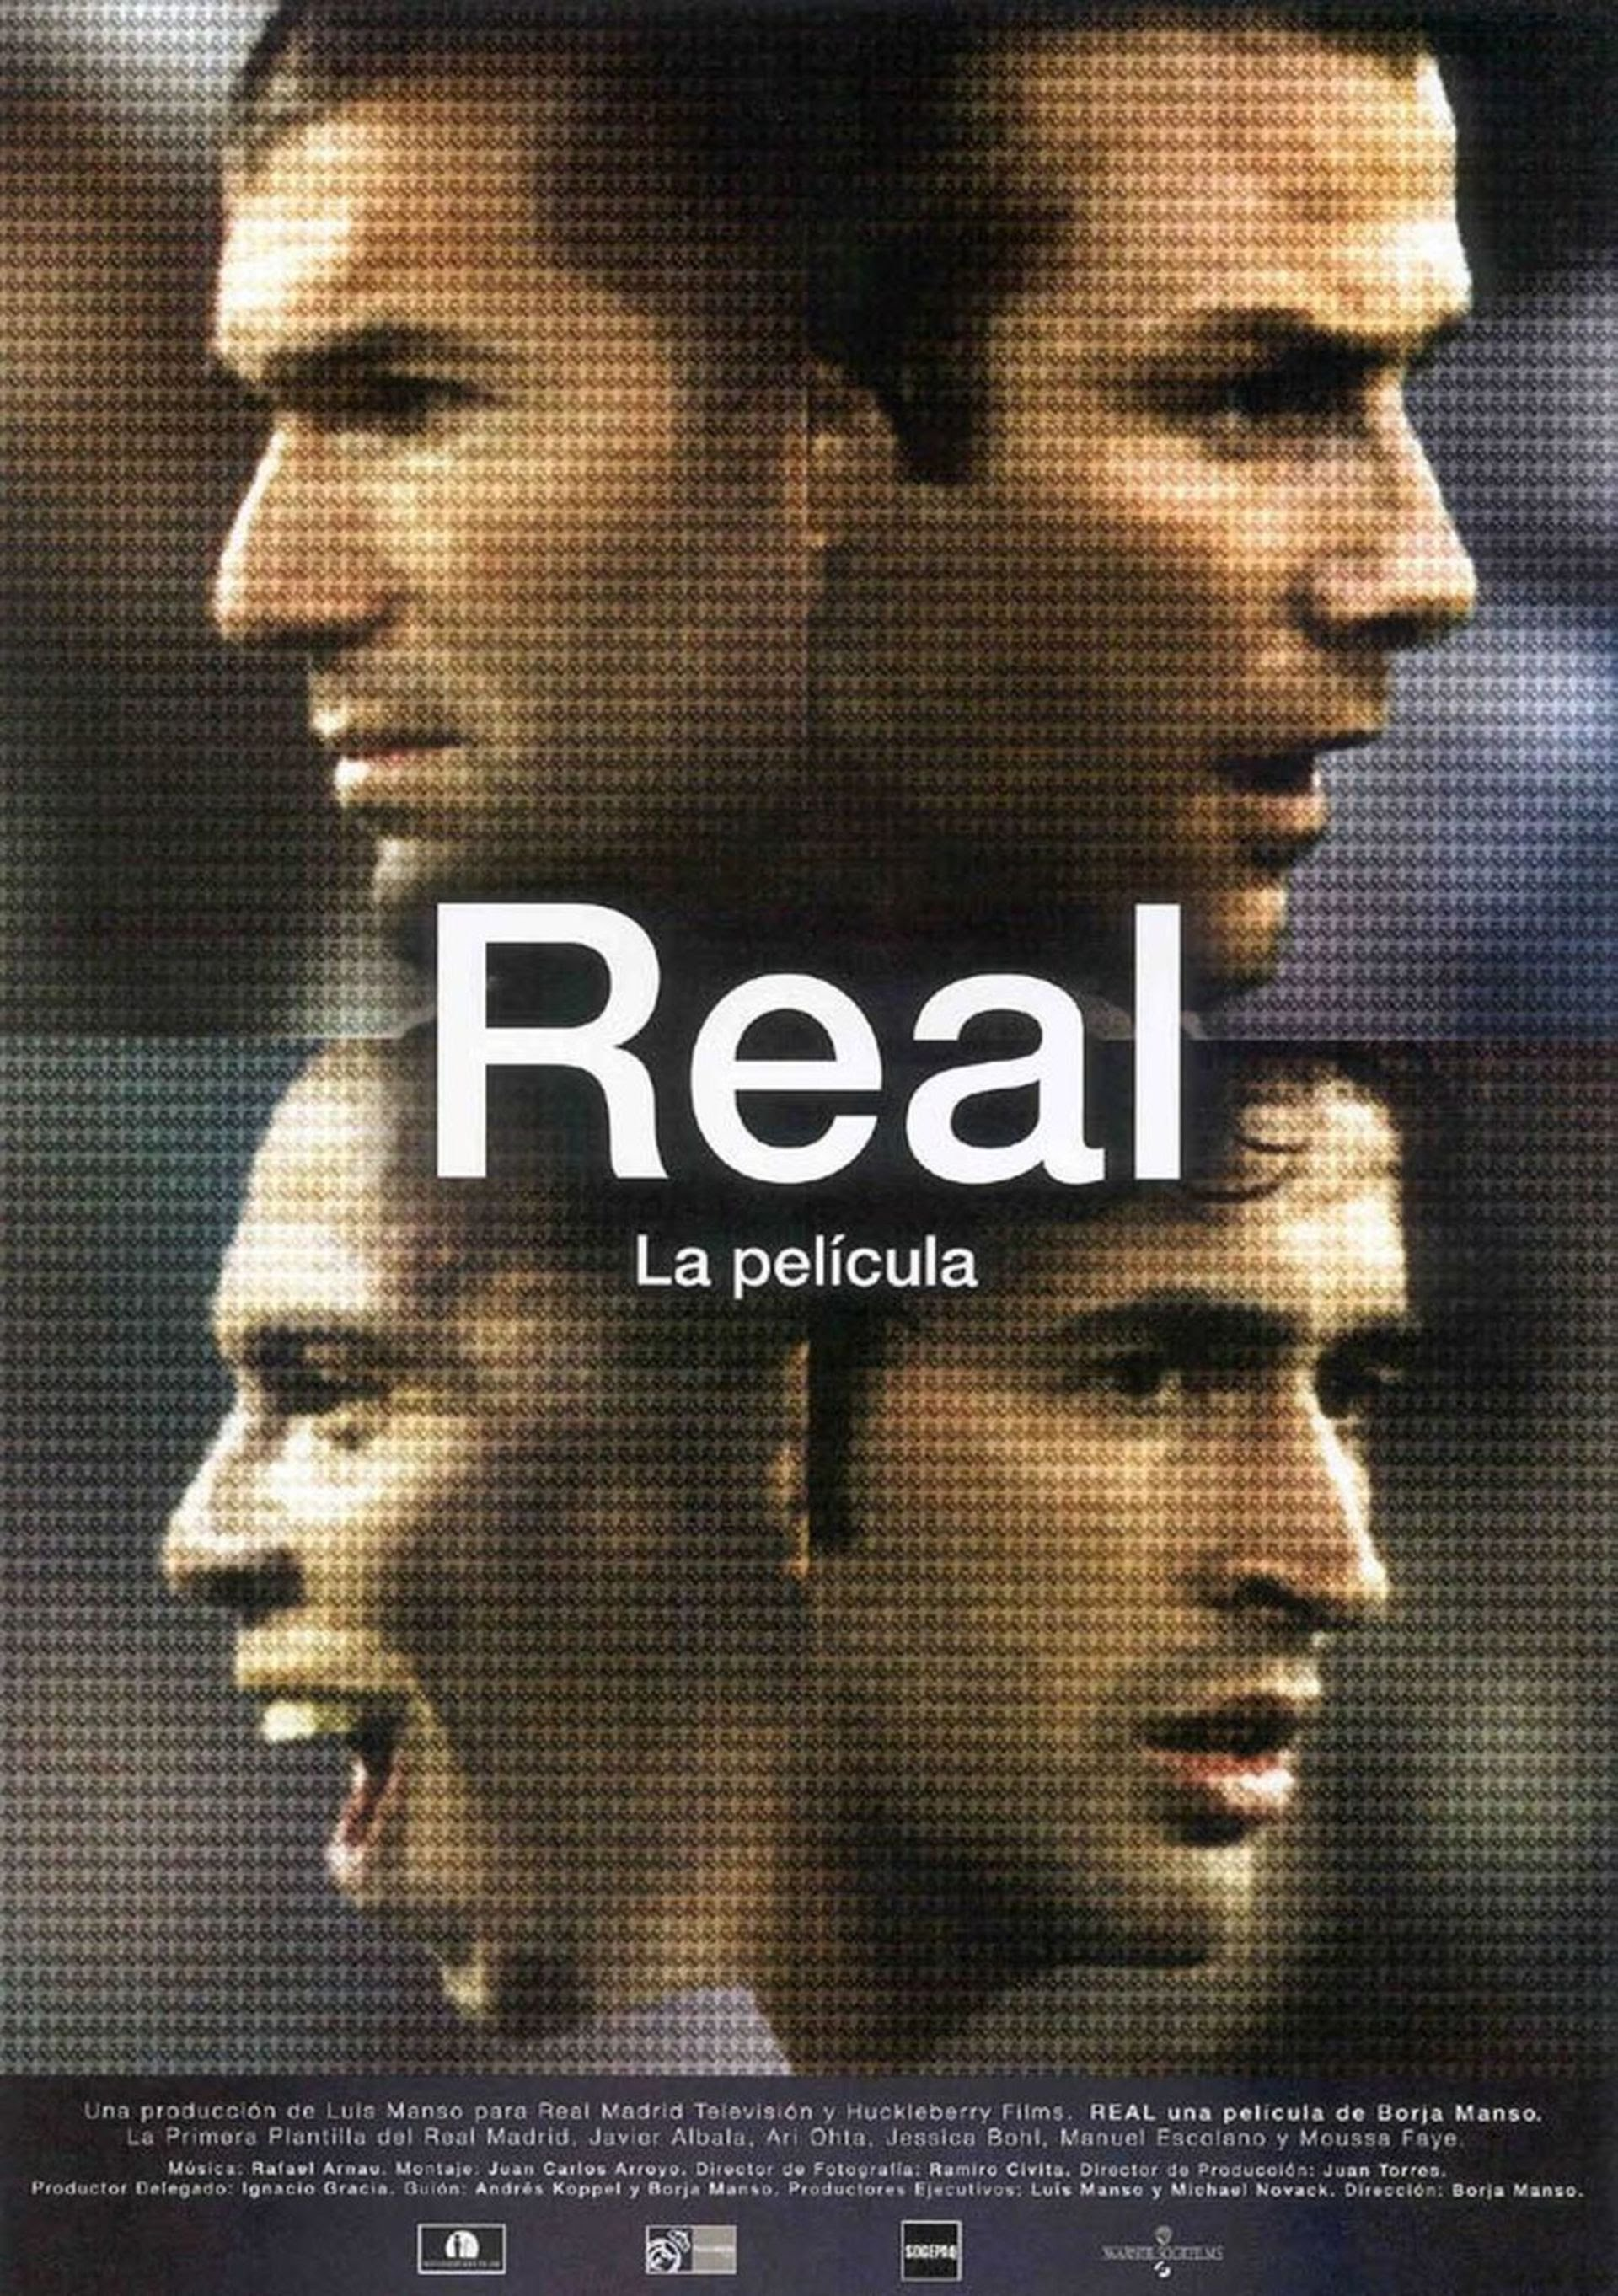 Real Madrid, a film